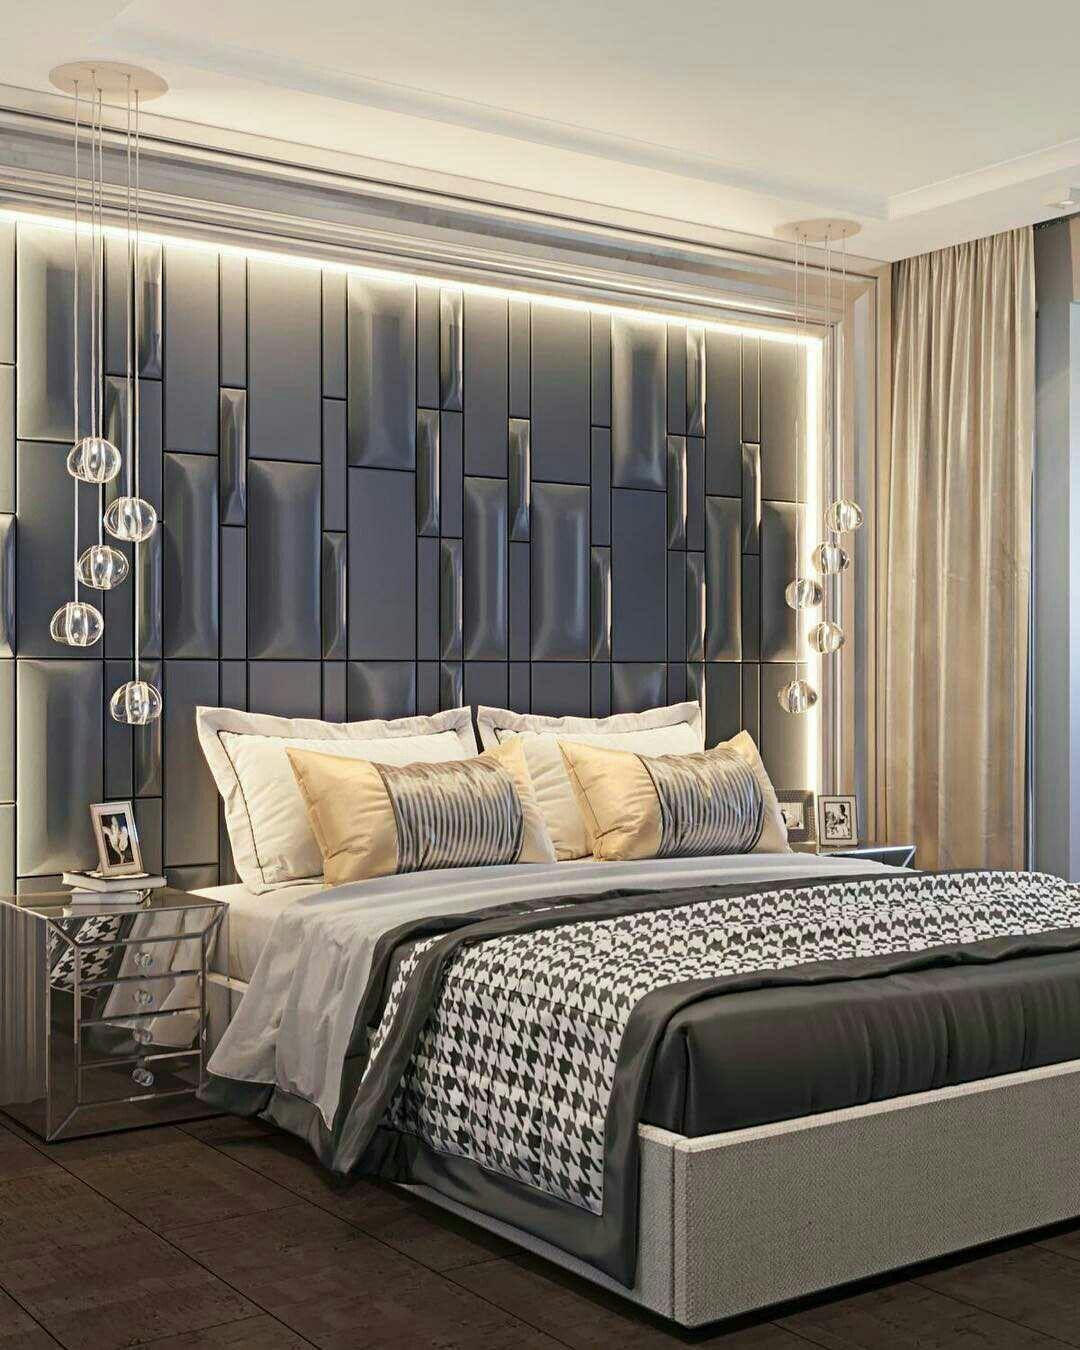 Pin By Rana Mohamed On Room Decor Bed Headboard Design